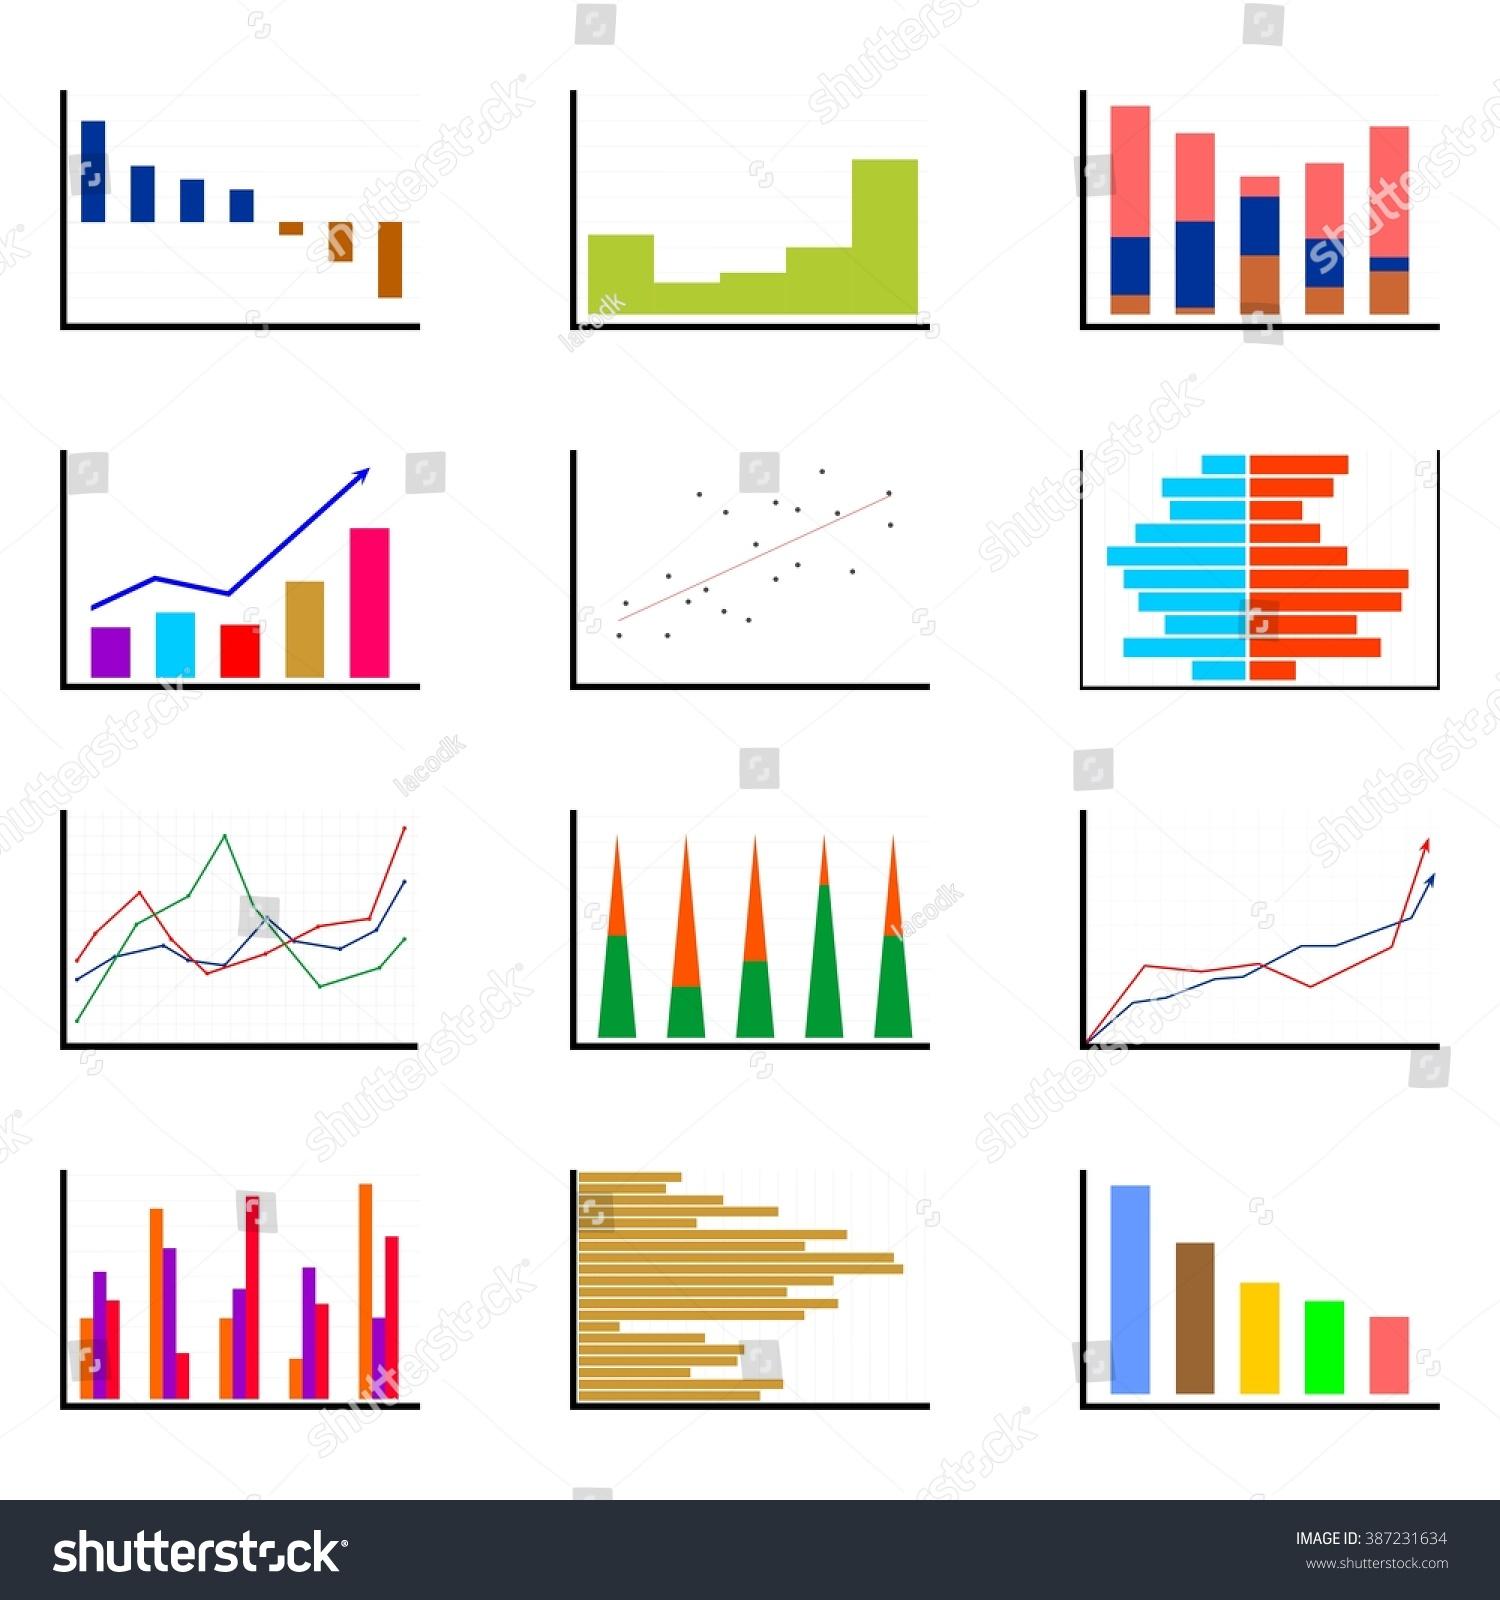 Set Various Bar Graphs Different Colors Stock Vector